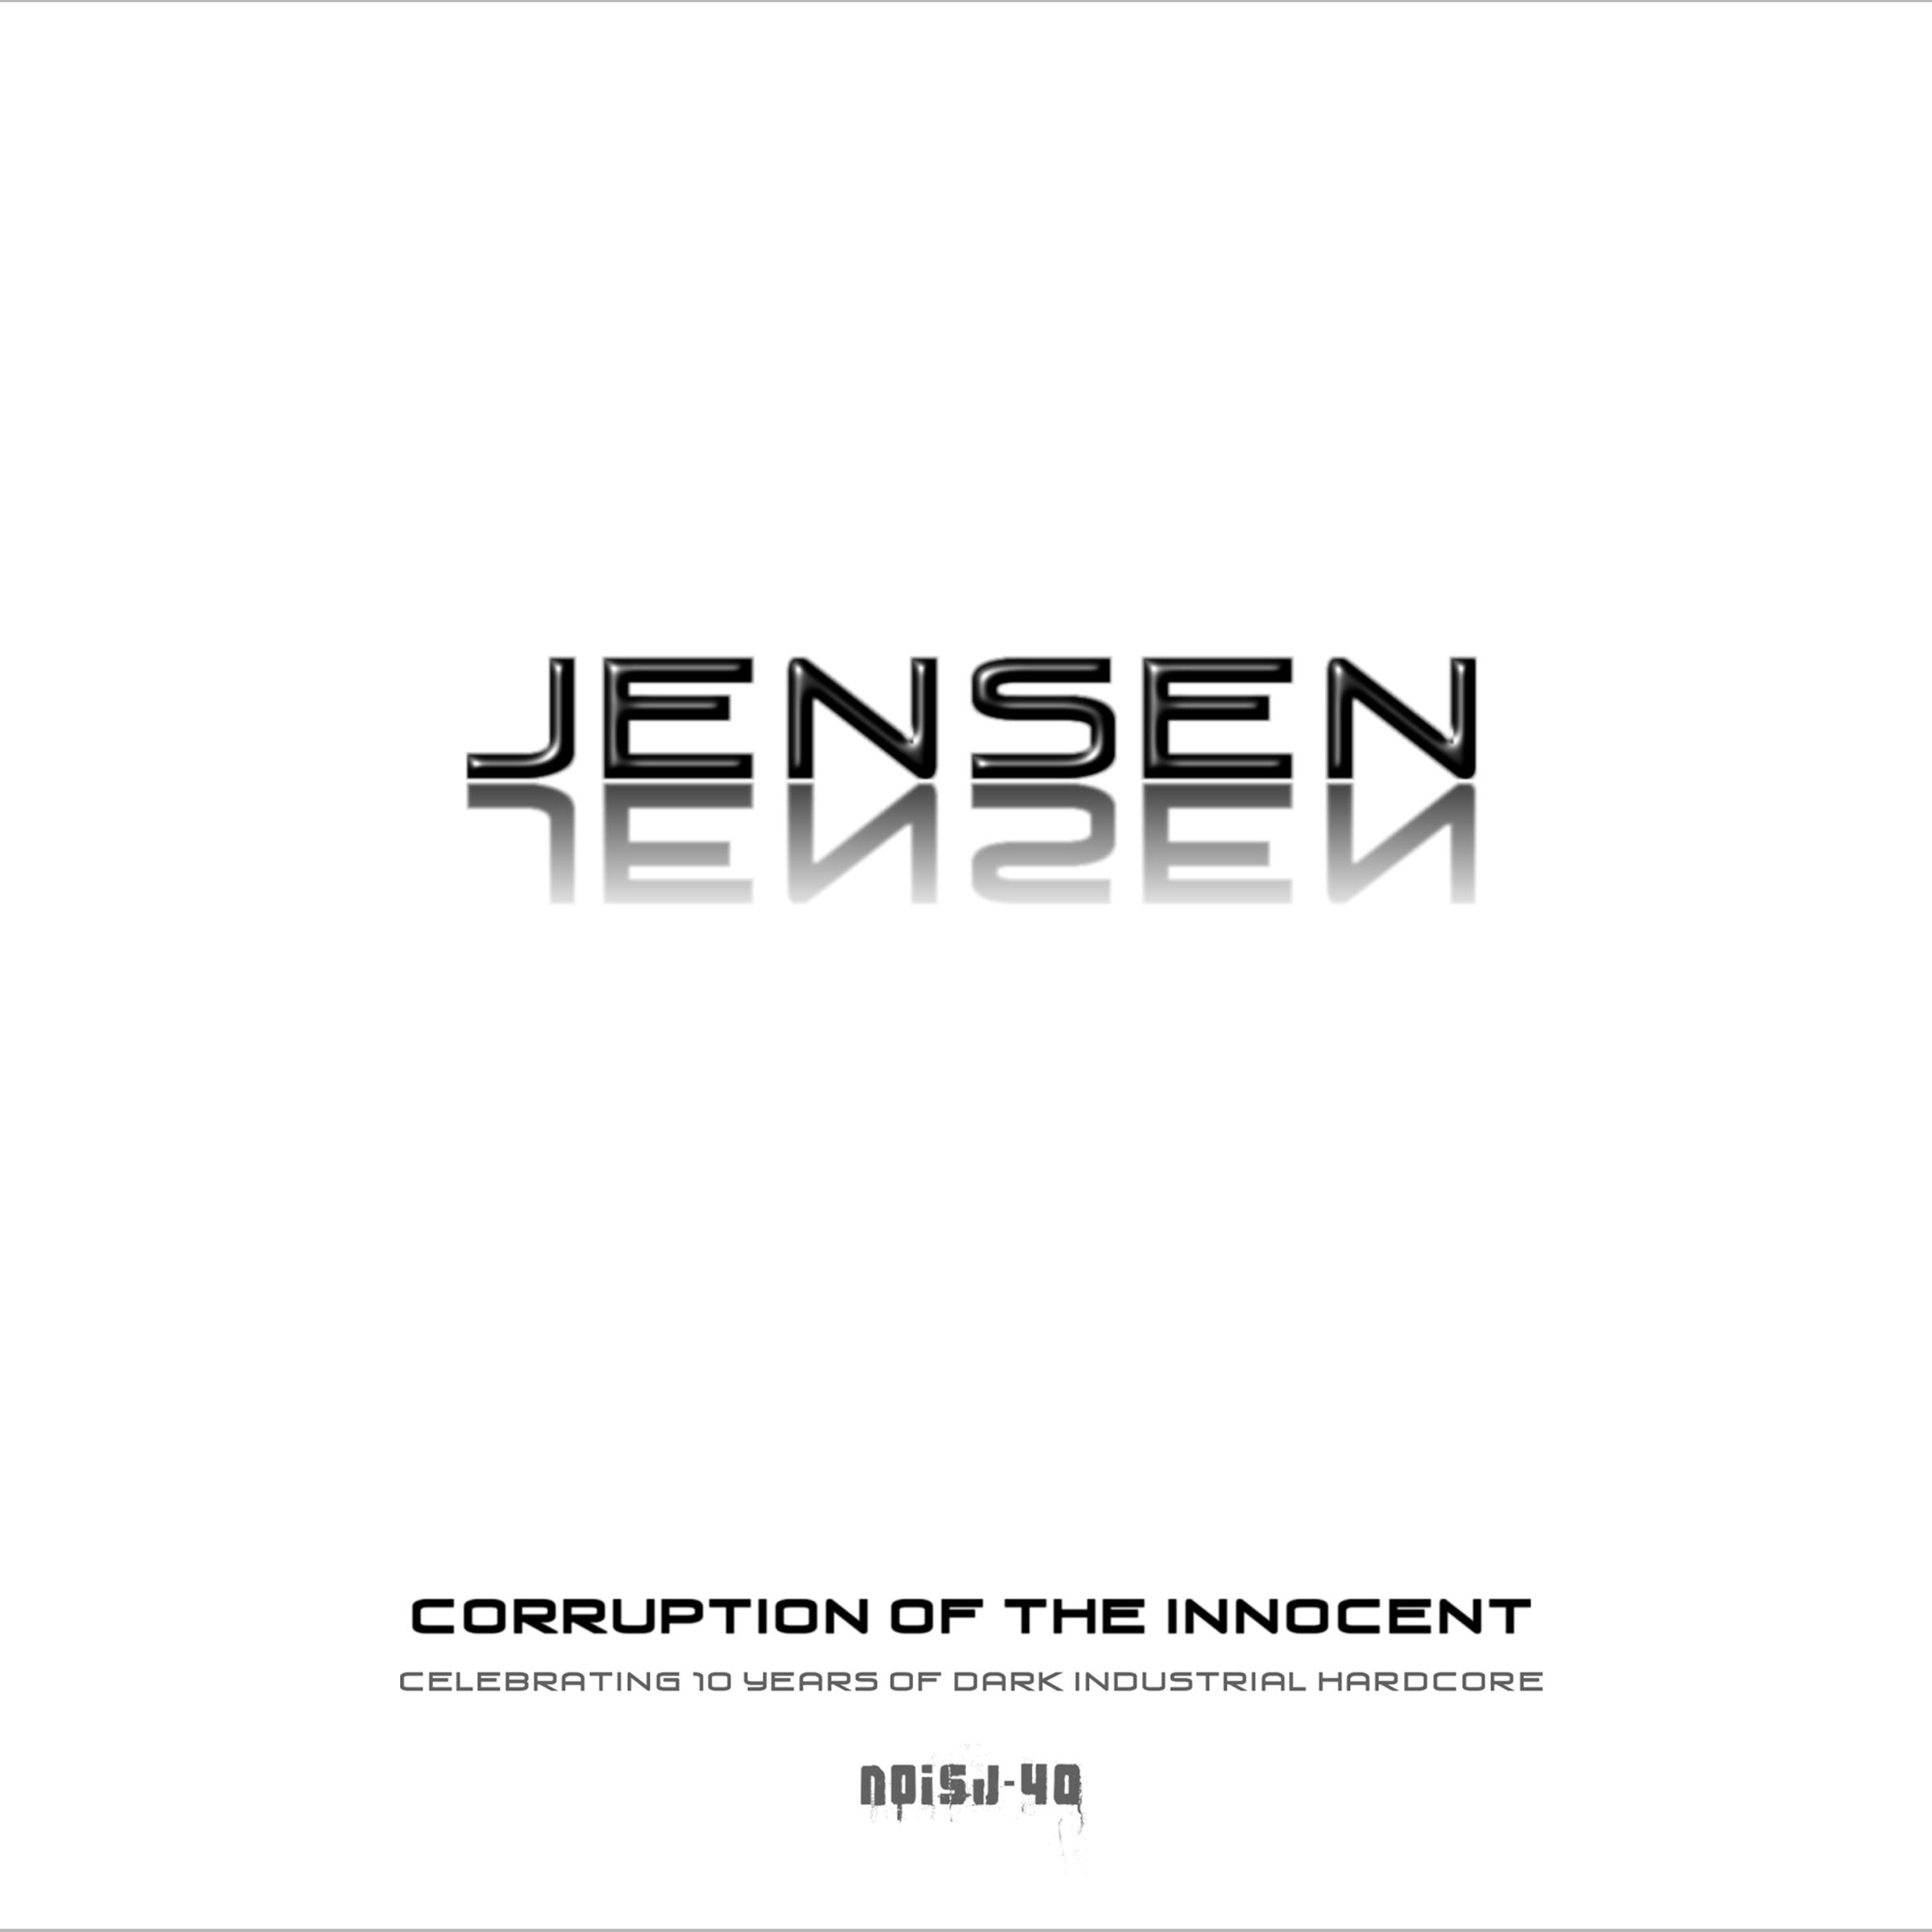 Jensen - Perestroika Definition